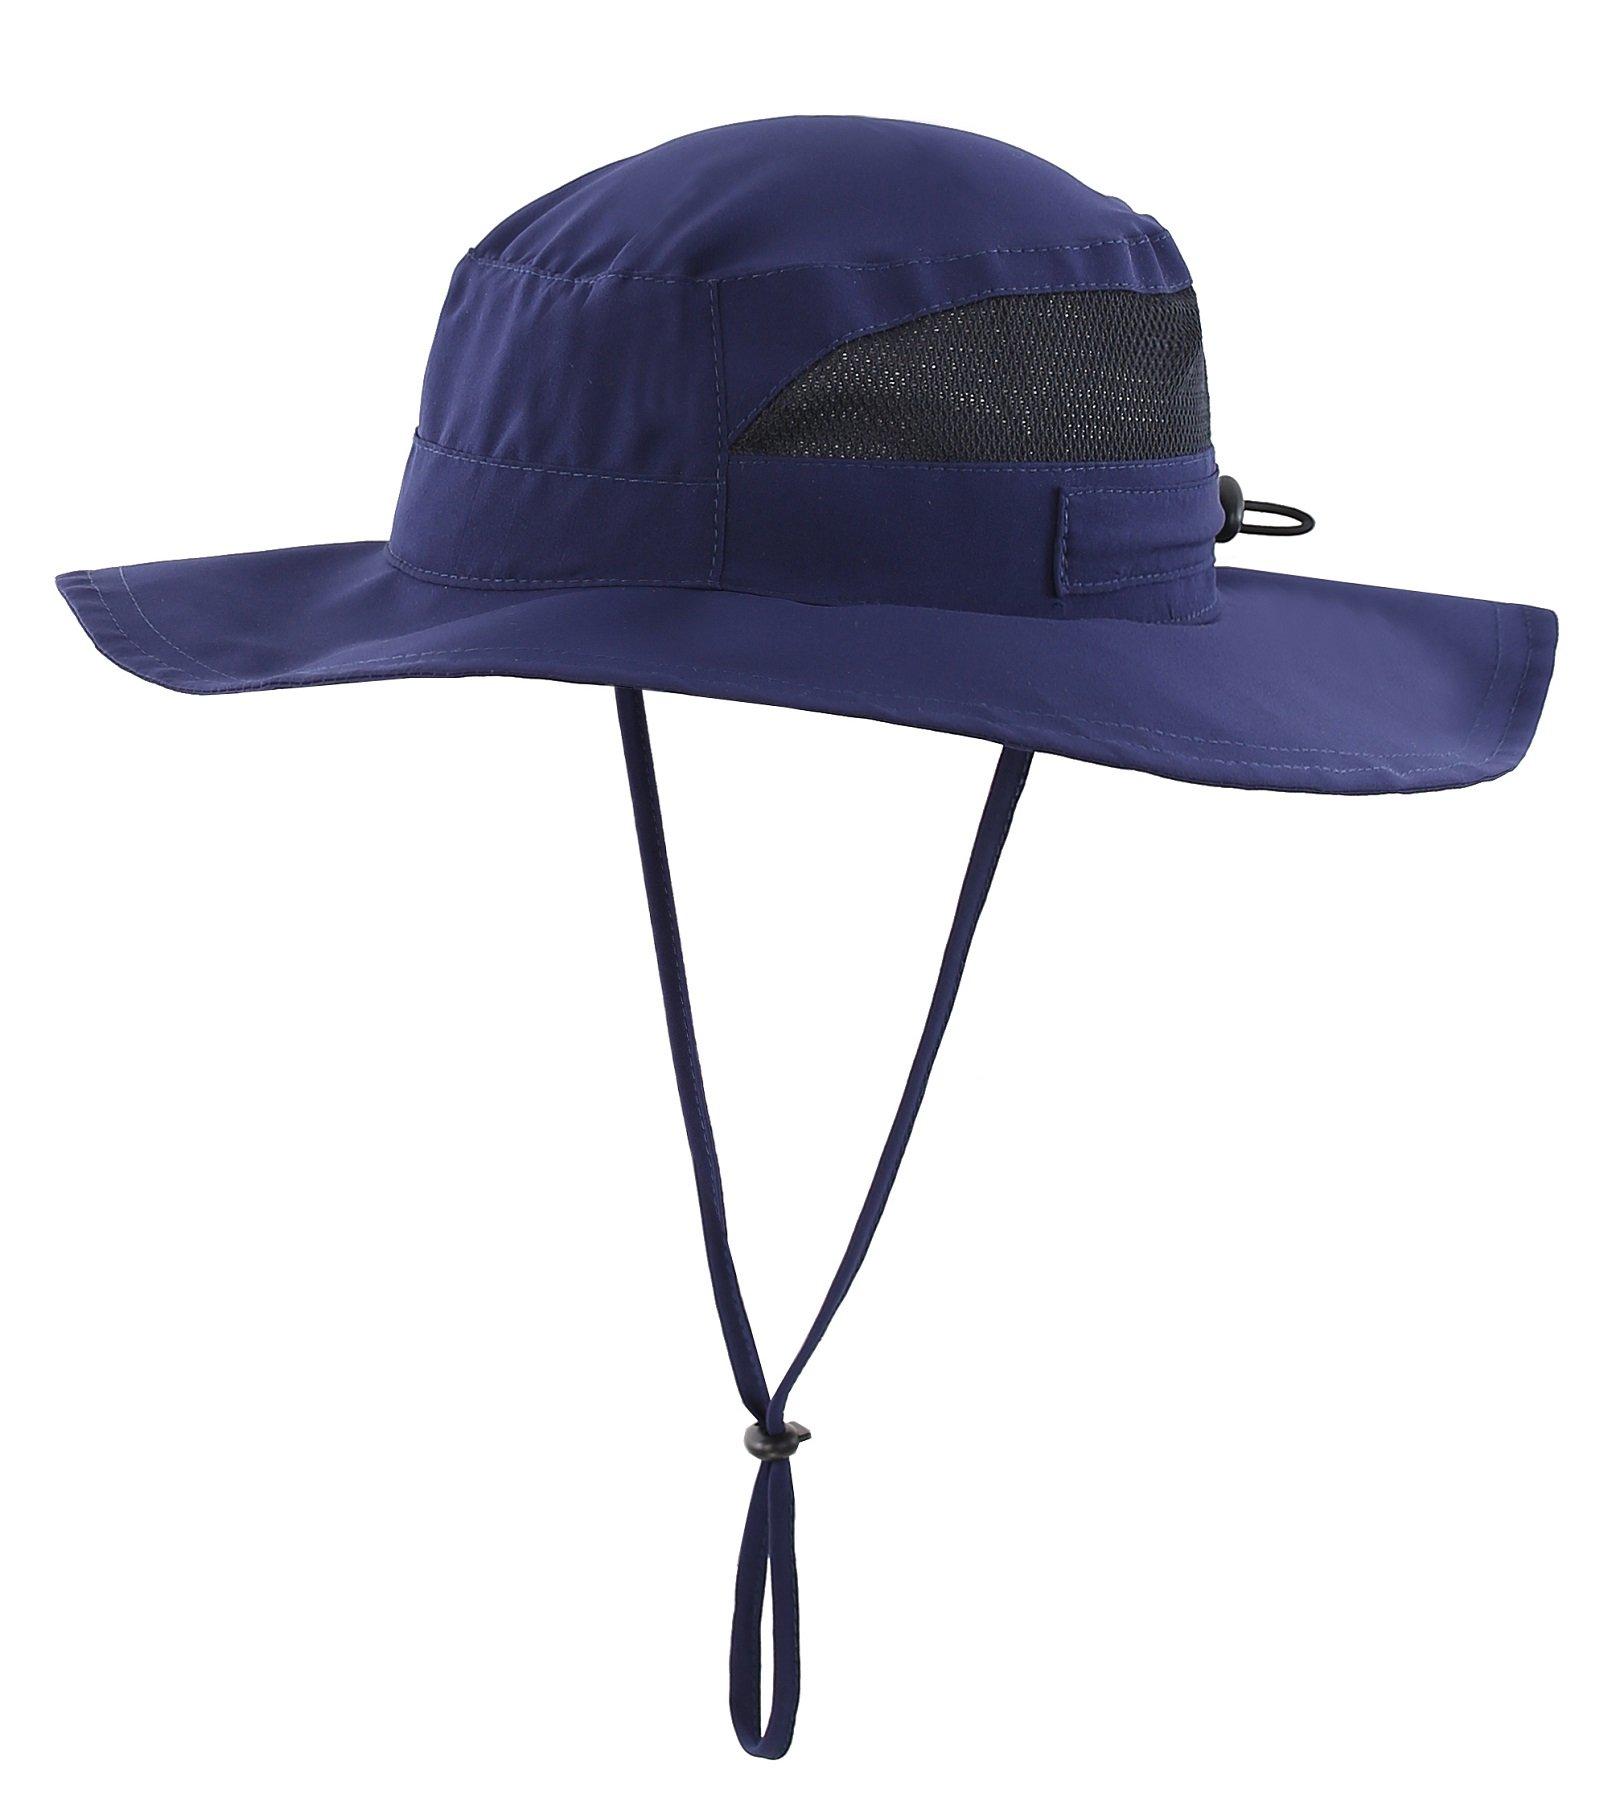 Connectyle Child Kids UPF 50+ Mesh Safari Sun Hat UV Sun Protection Hat Summer Daily Bucket Hat Navy Blue by Connectyle